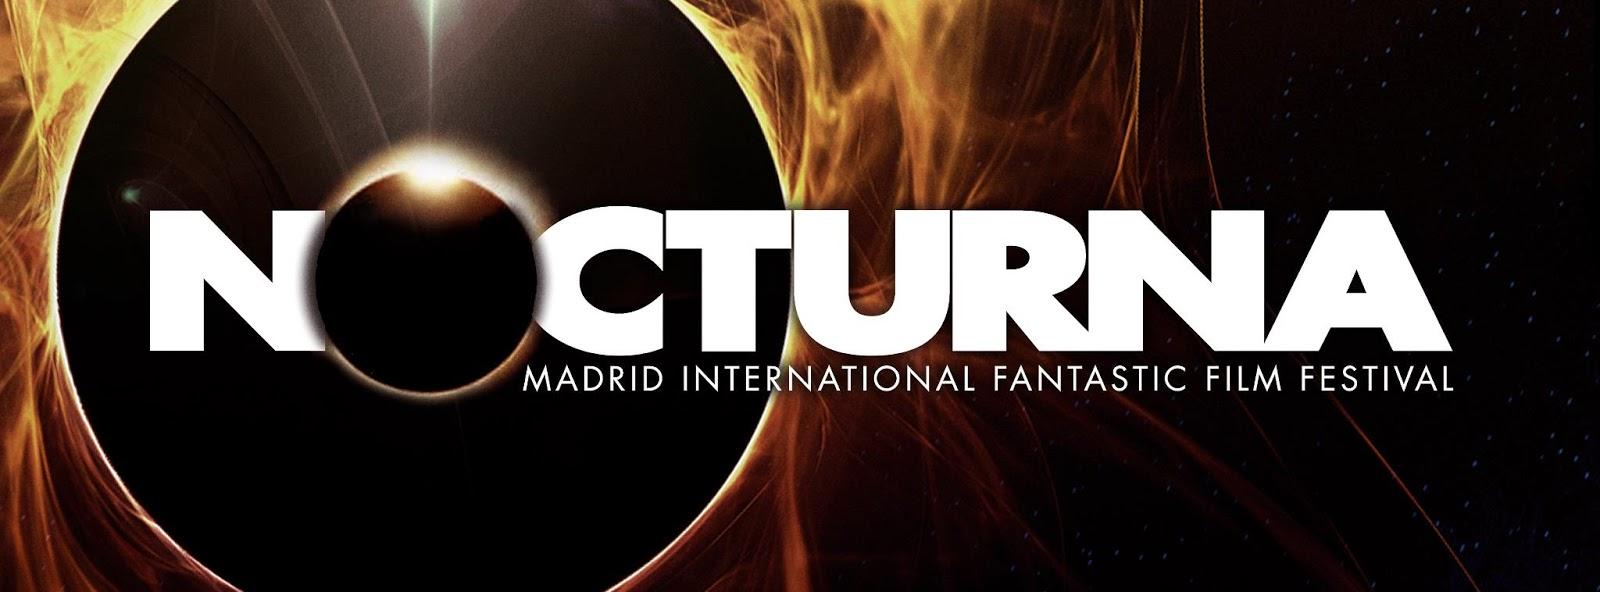 Nocturna - Festival Internacional de Cine Fantástico de Madrid